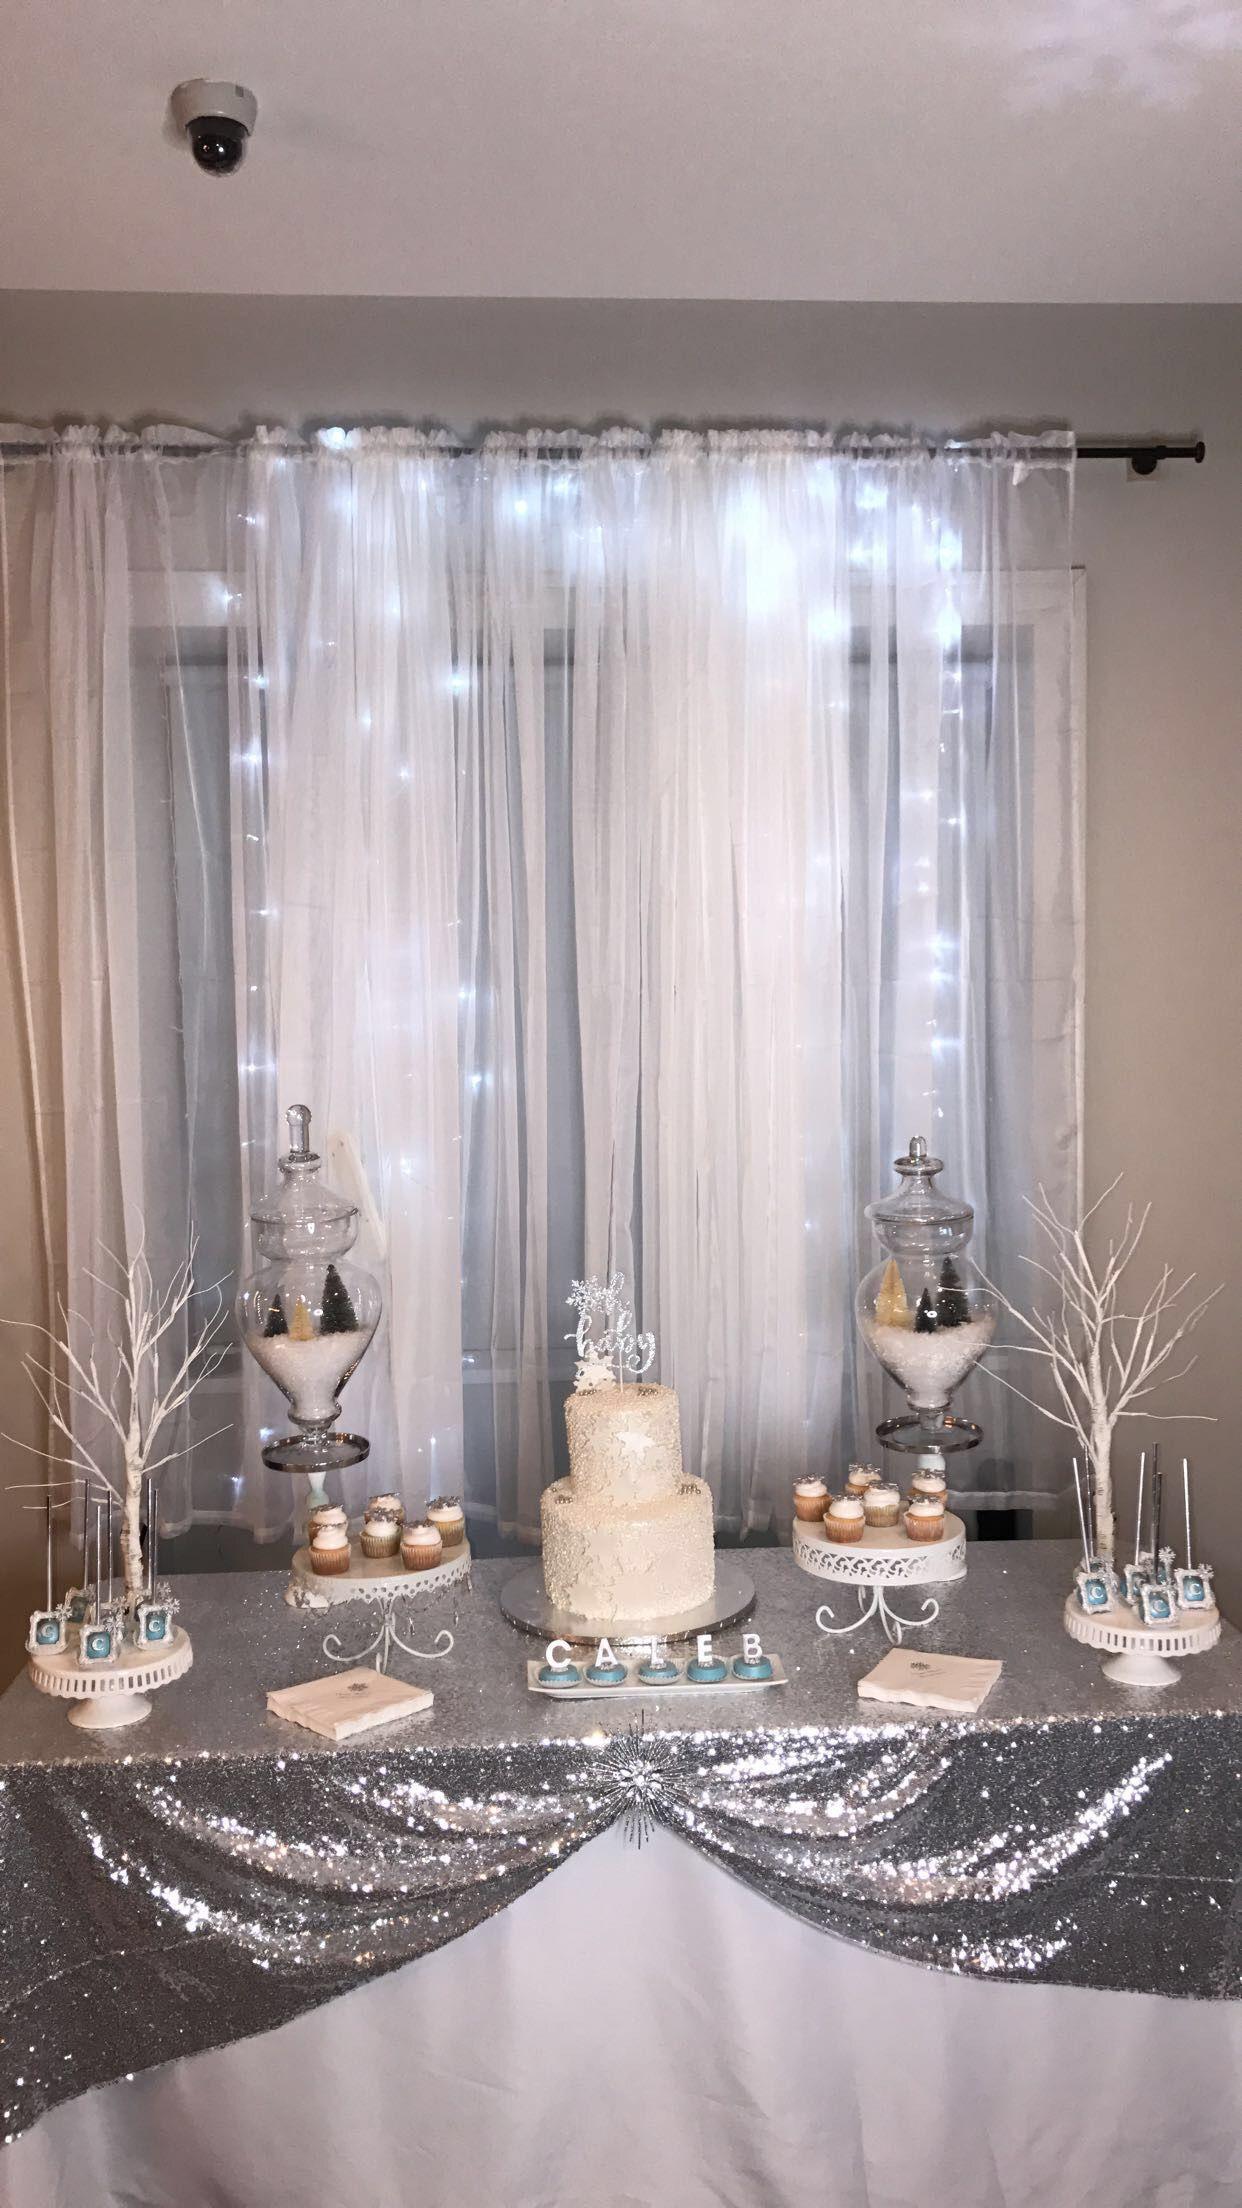 Diy Winter Wonderland Baby Shower Decorations  from i.pinimg.com